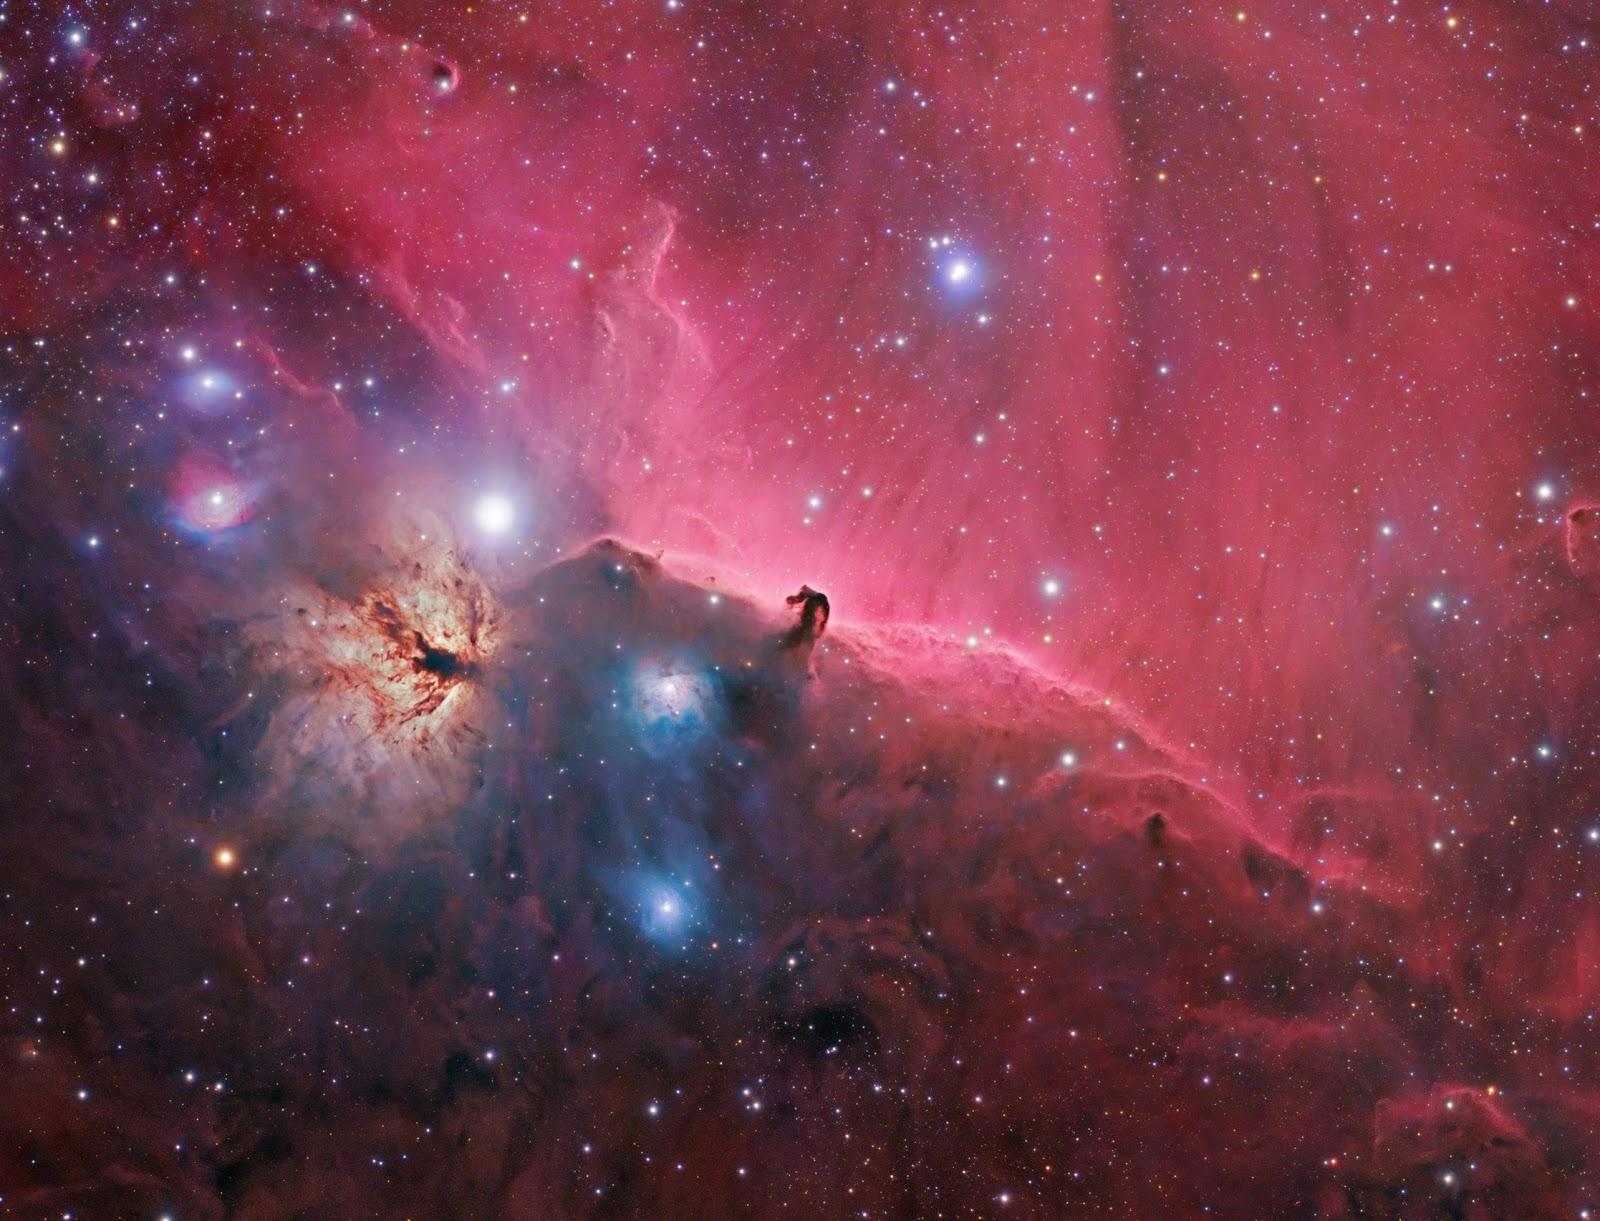 Good   Wallpaper Horse Nebula - Horsehead-Nebula-Wallpaper-HD-30  You Should Have_152118.jpg